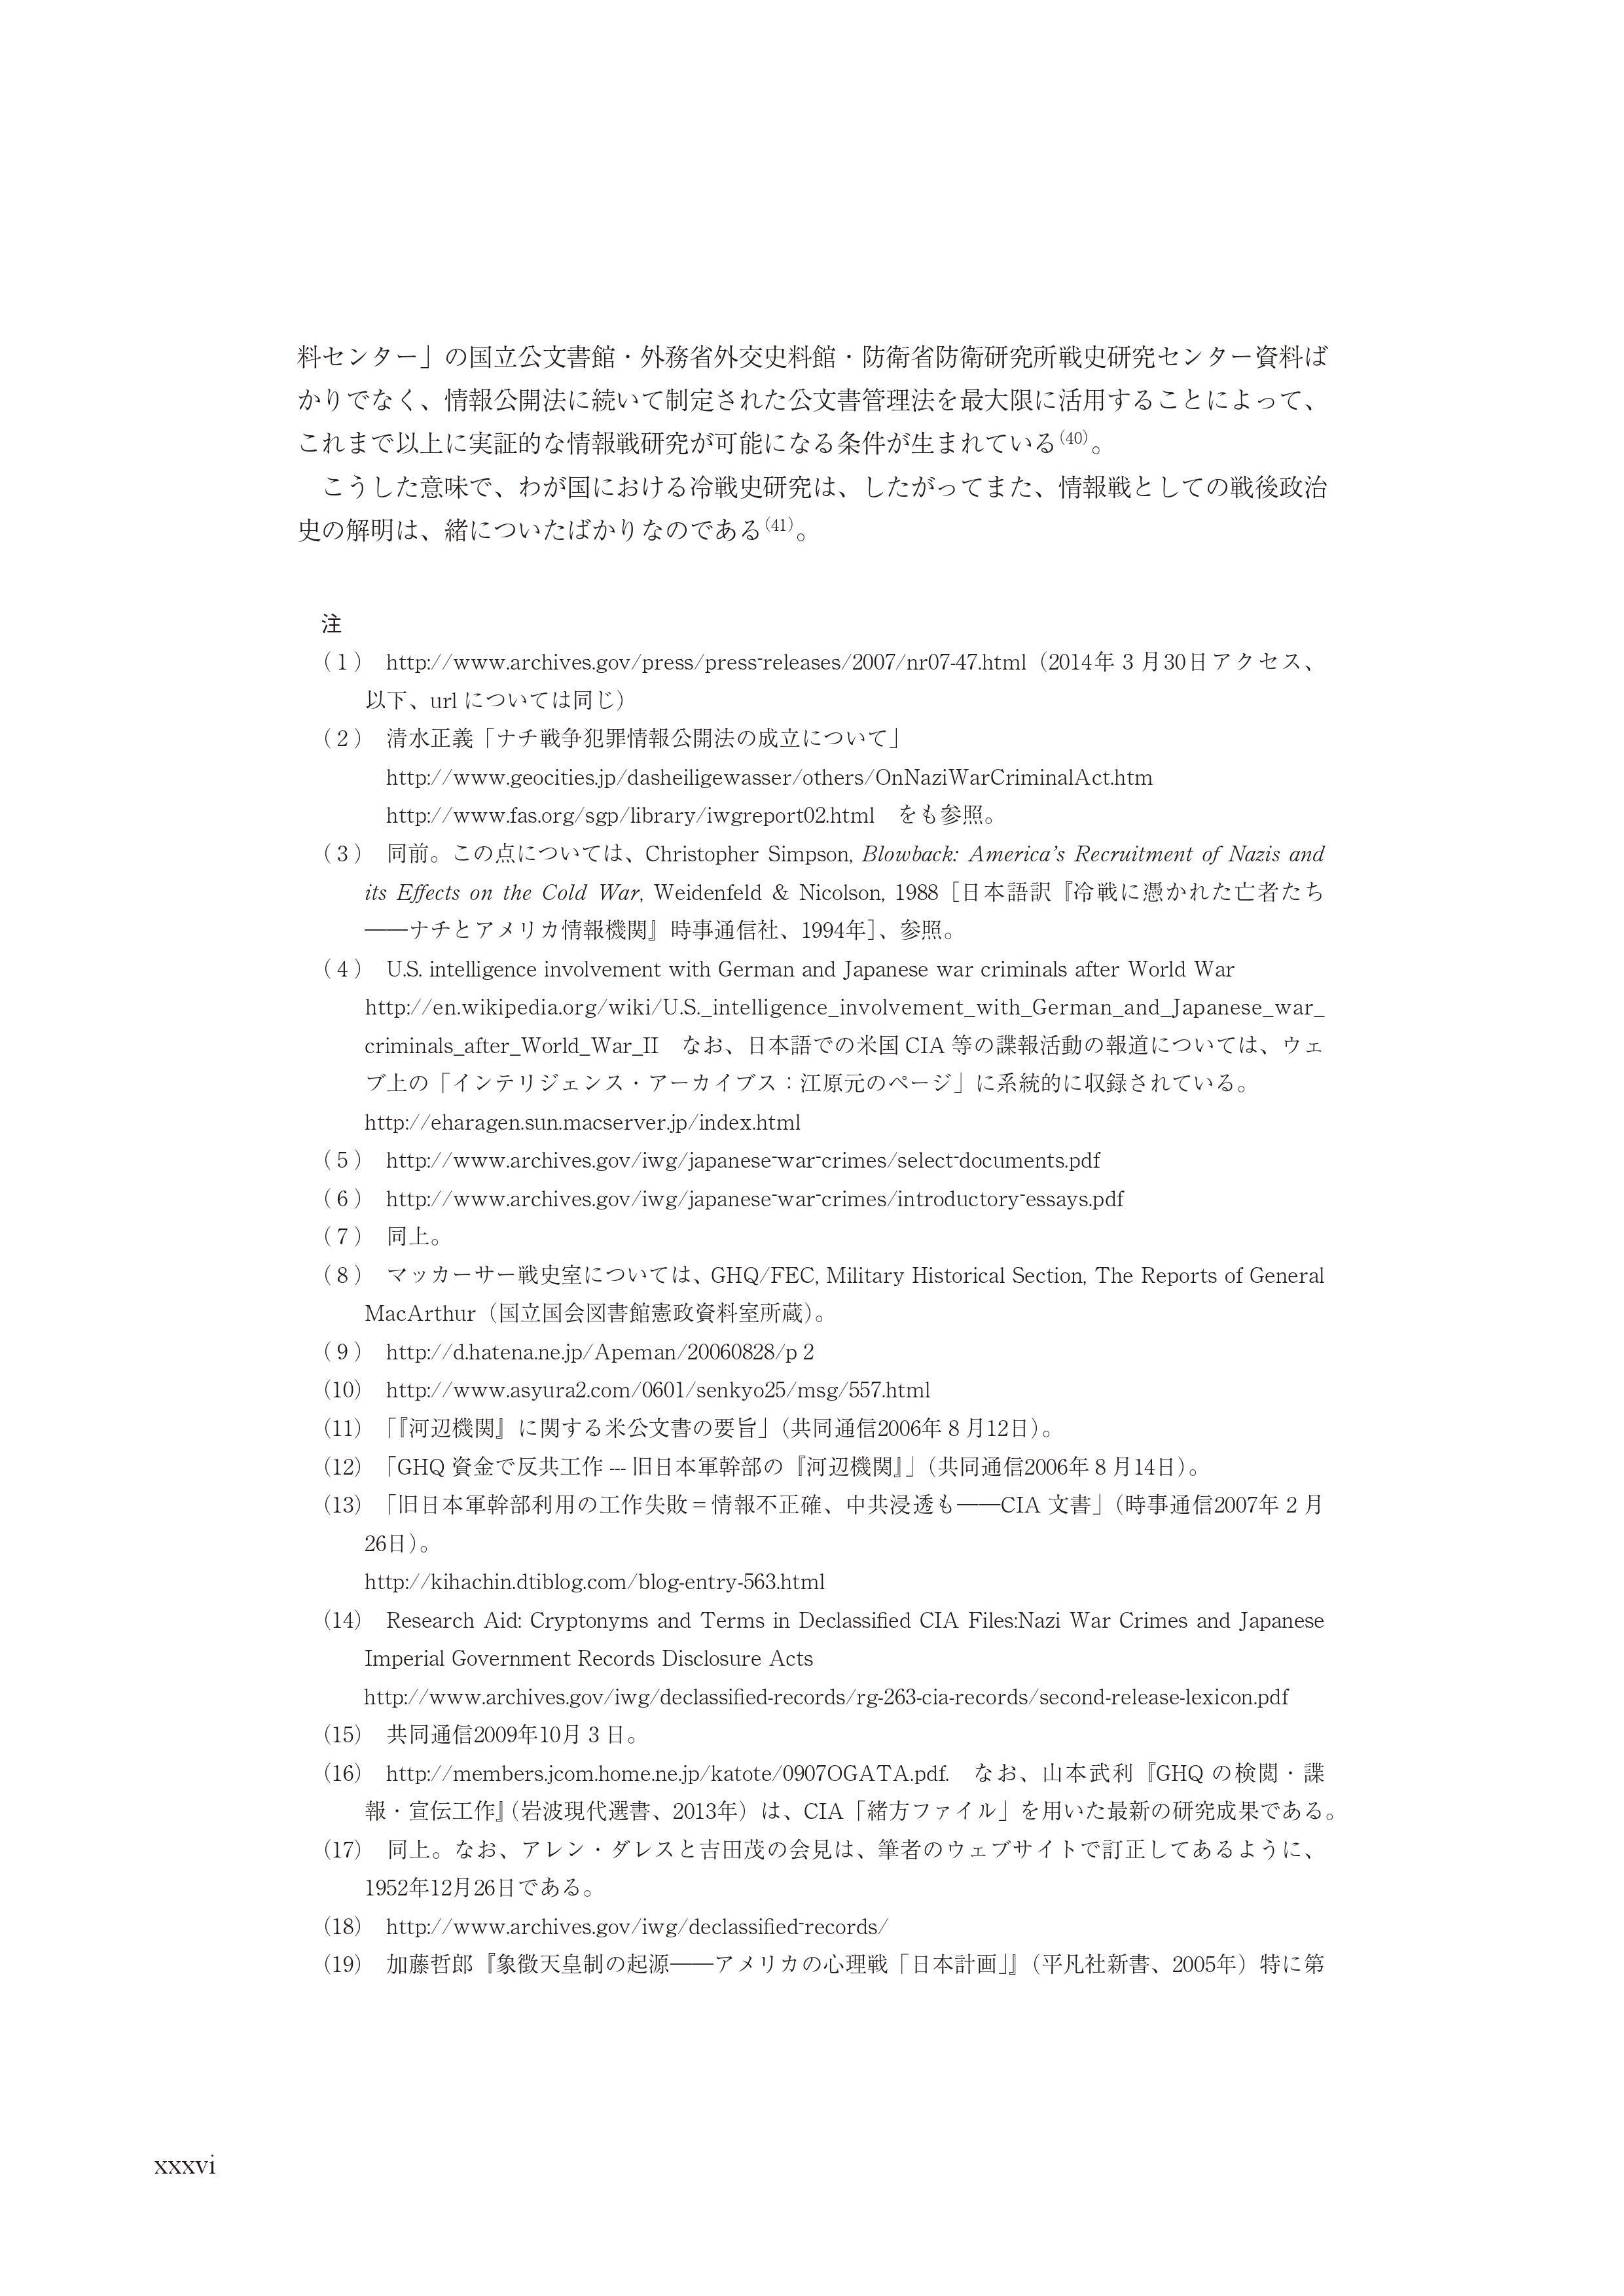 CIA日本人ファイル0001 (36)